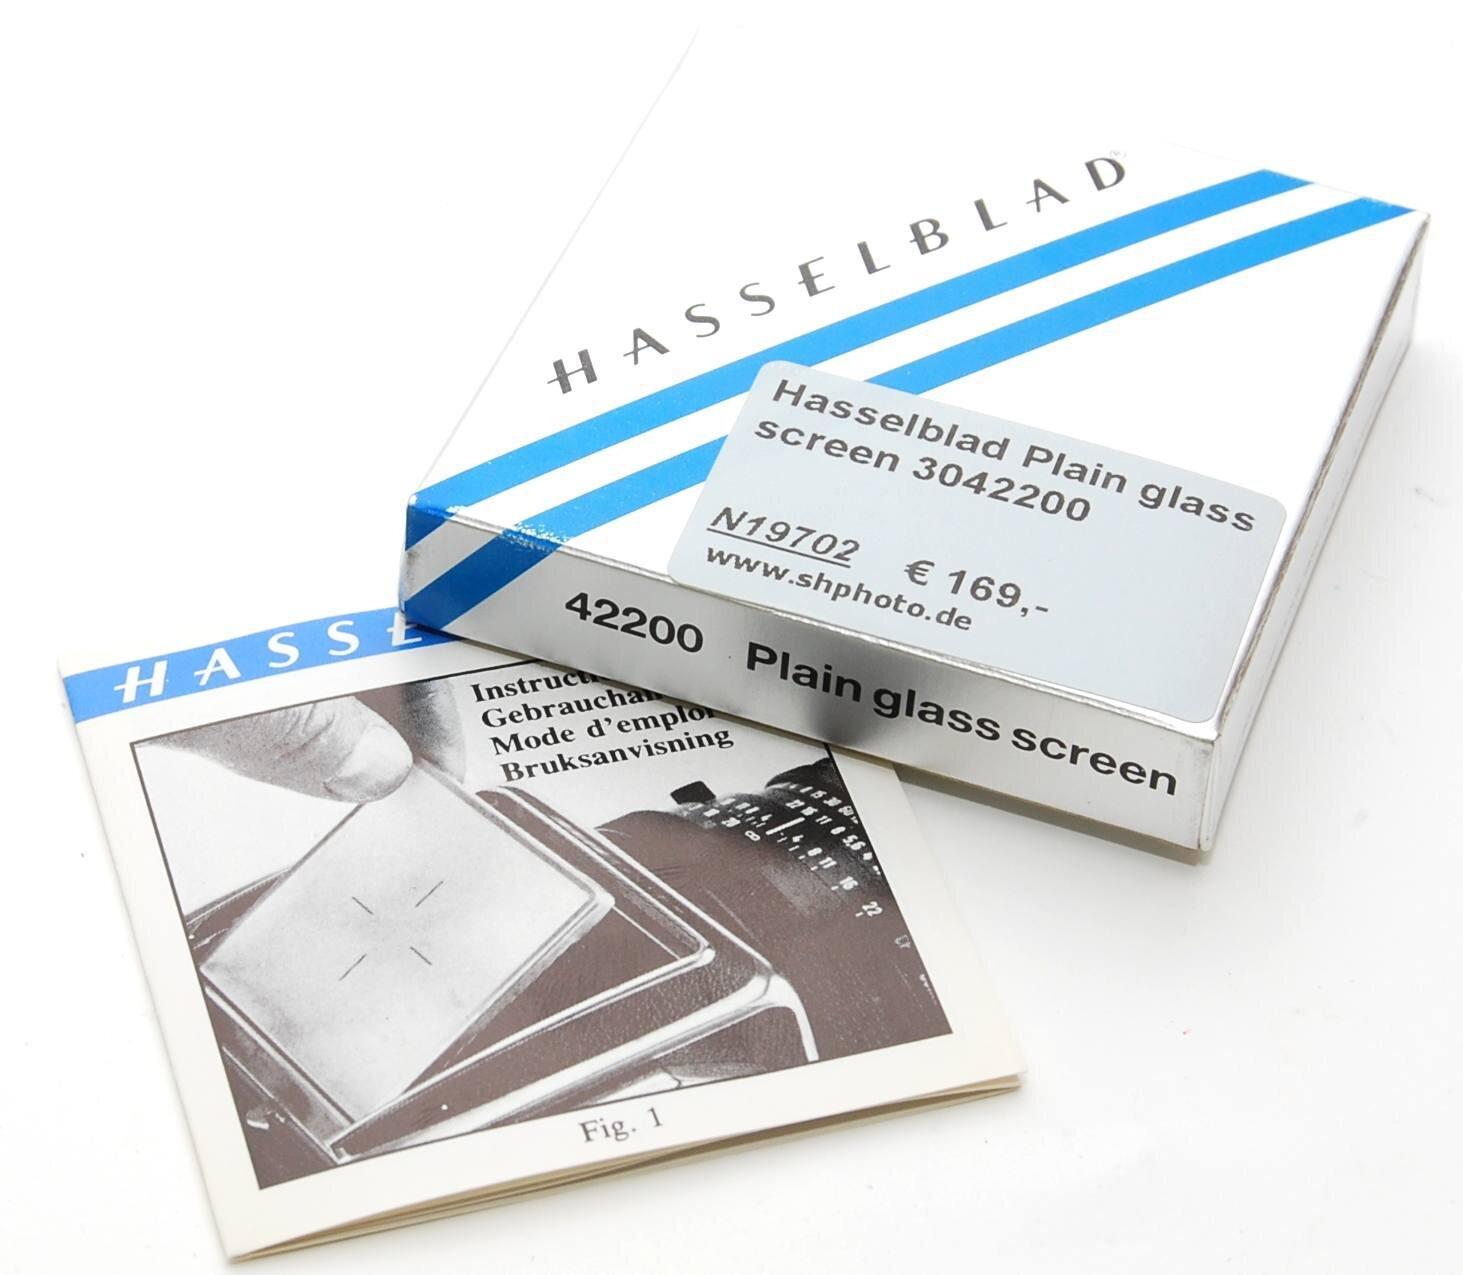 Hasselblad Plain glass screen 3042200